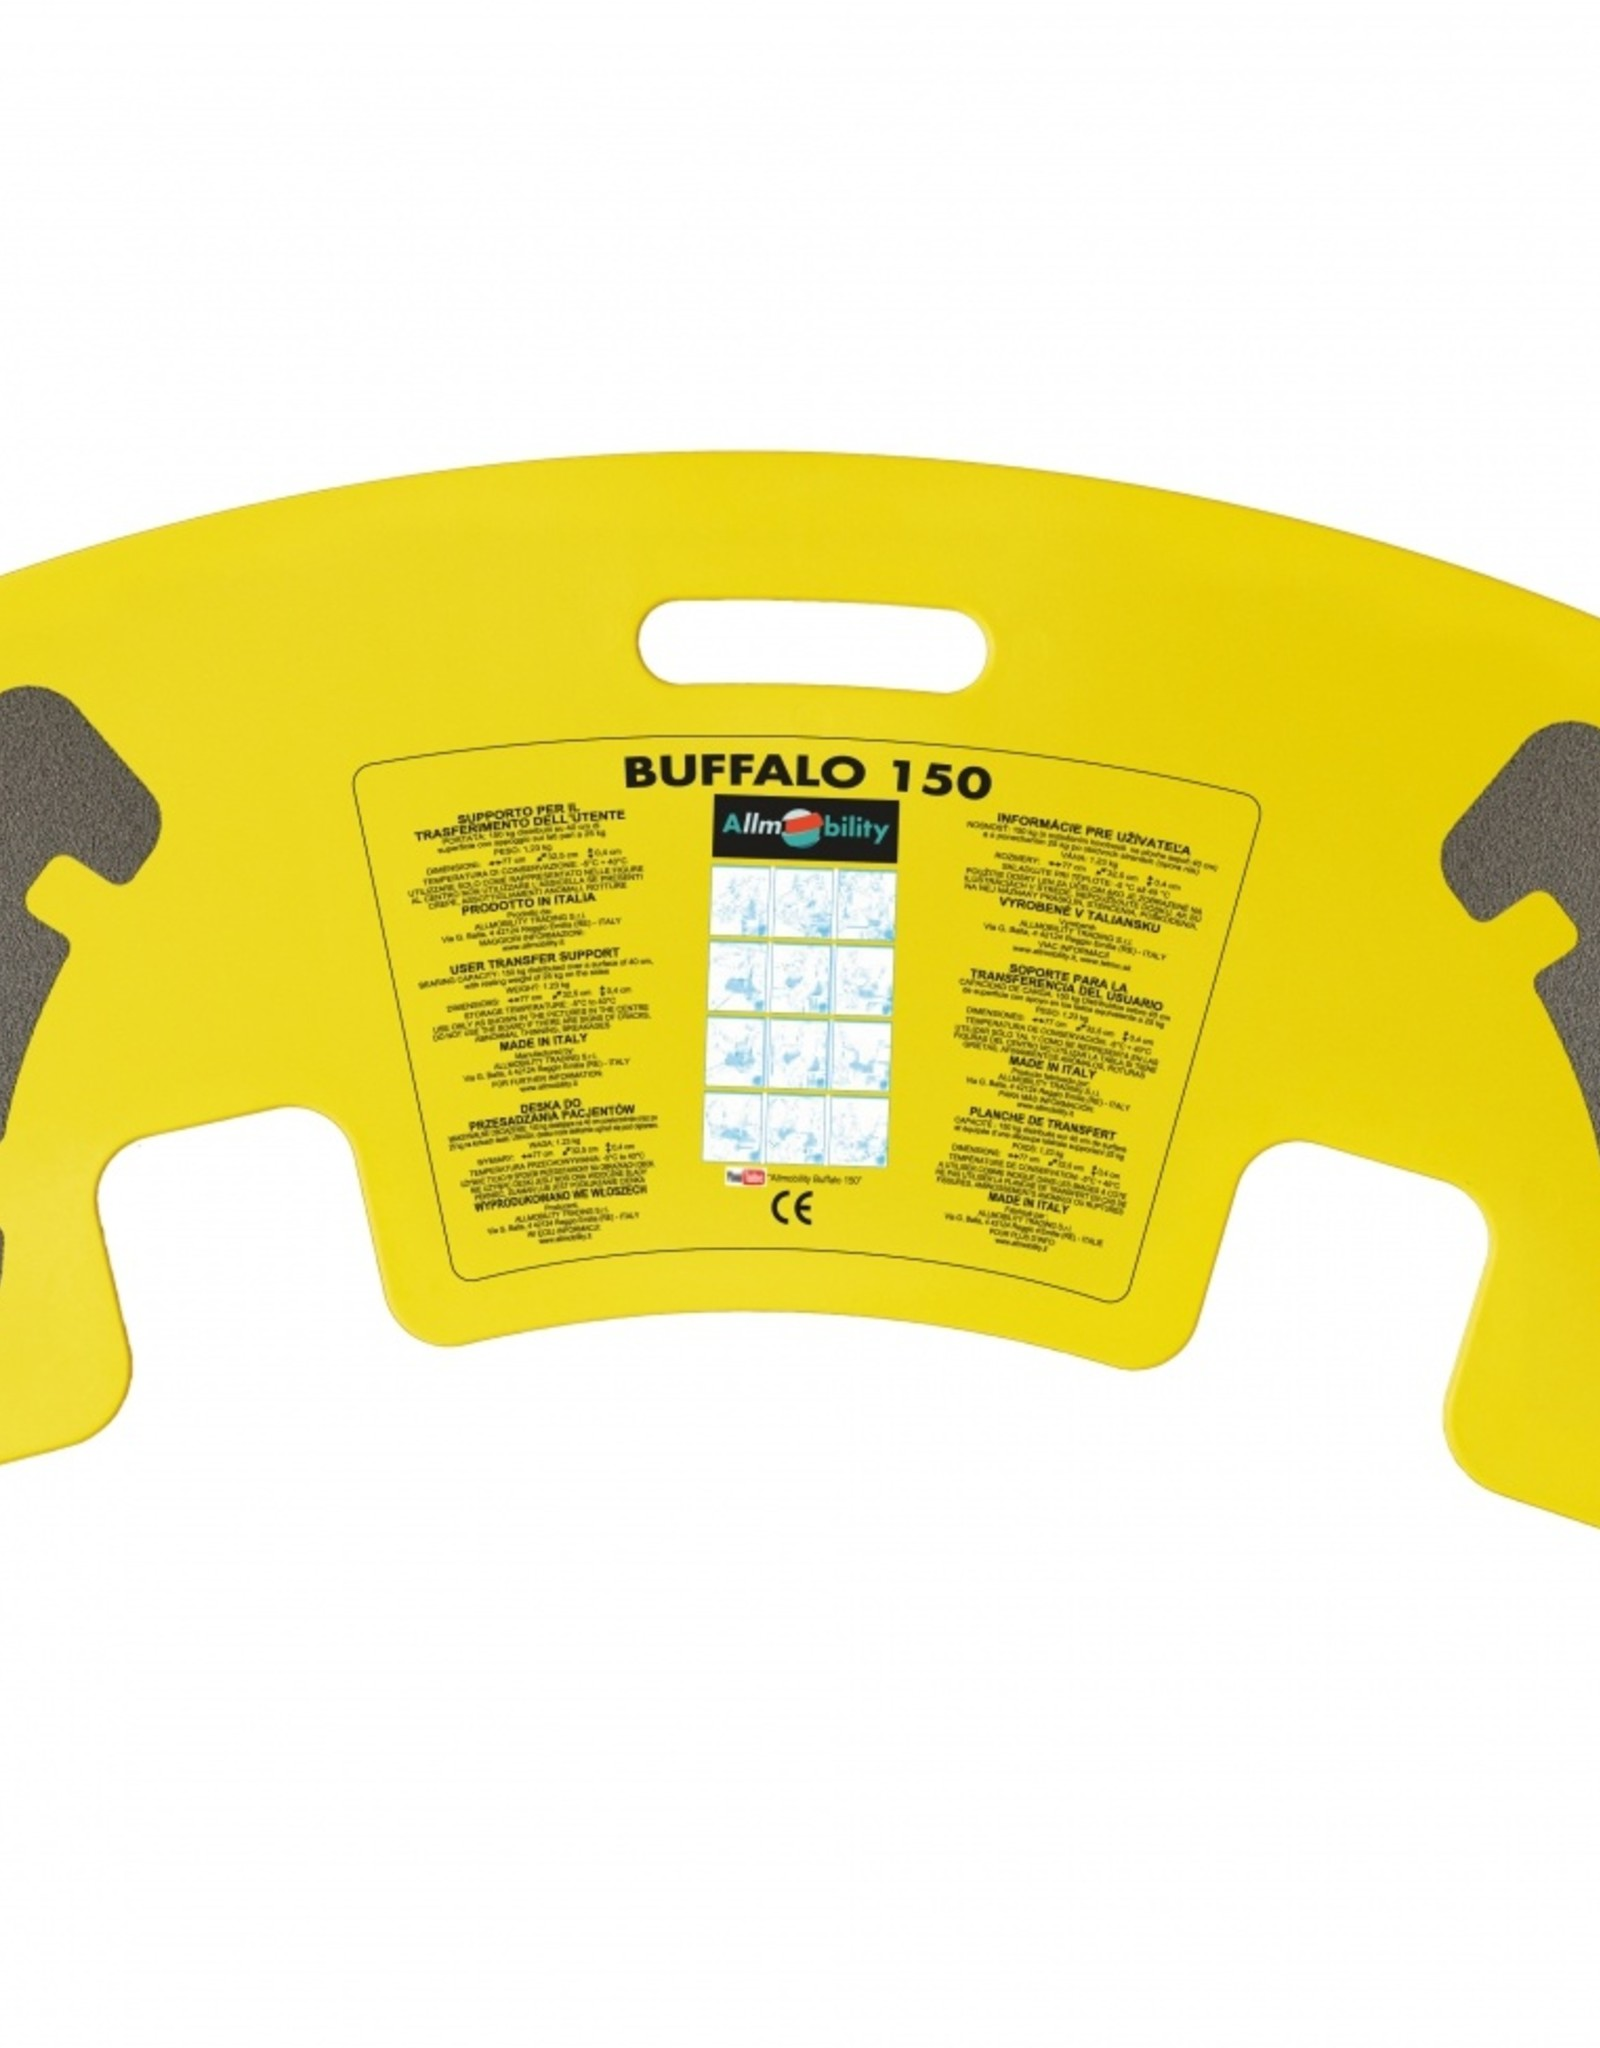 Buffalo transferplank met anti slip